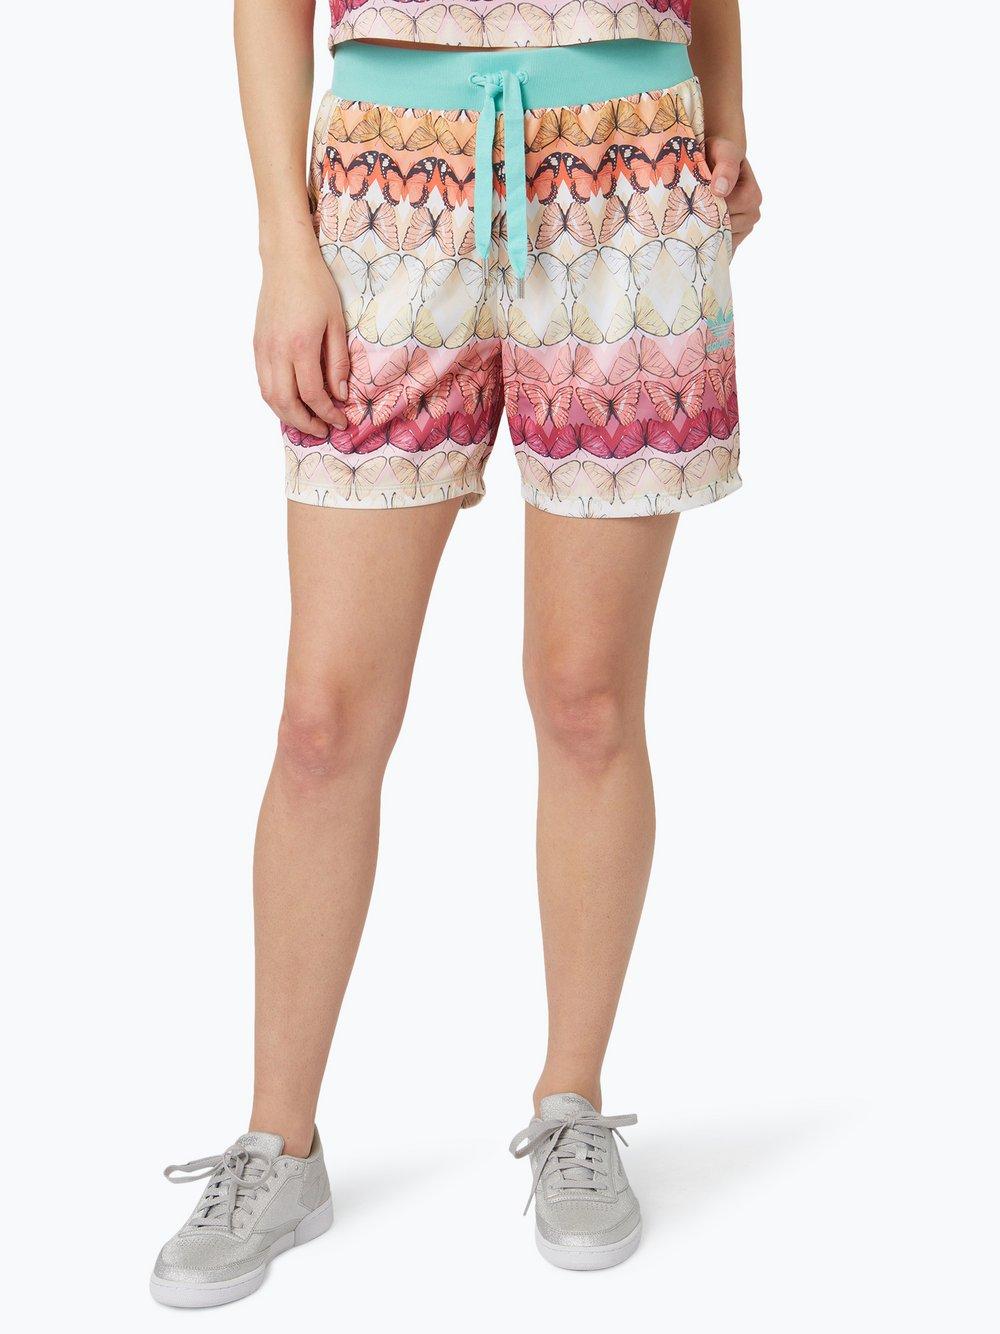 04268896e12b53 adidas Originals Damen Shorts online kaufen